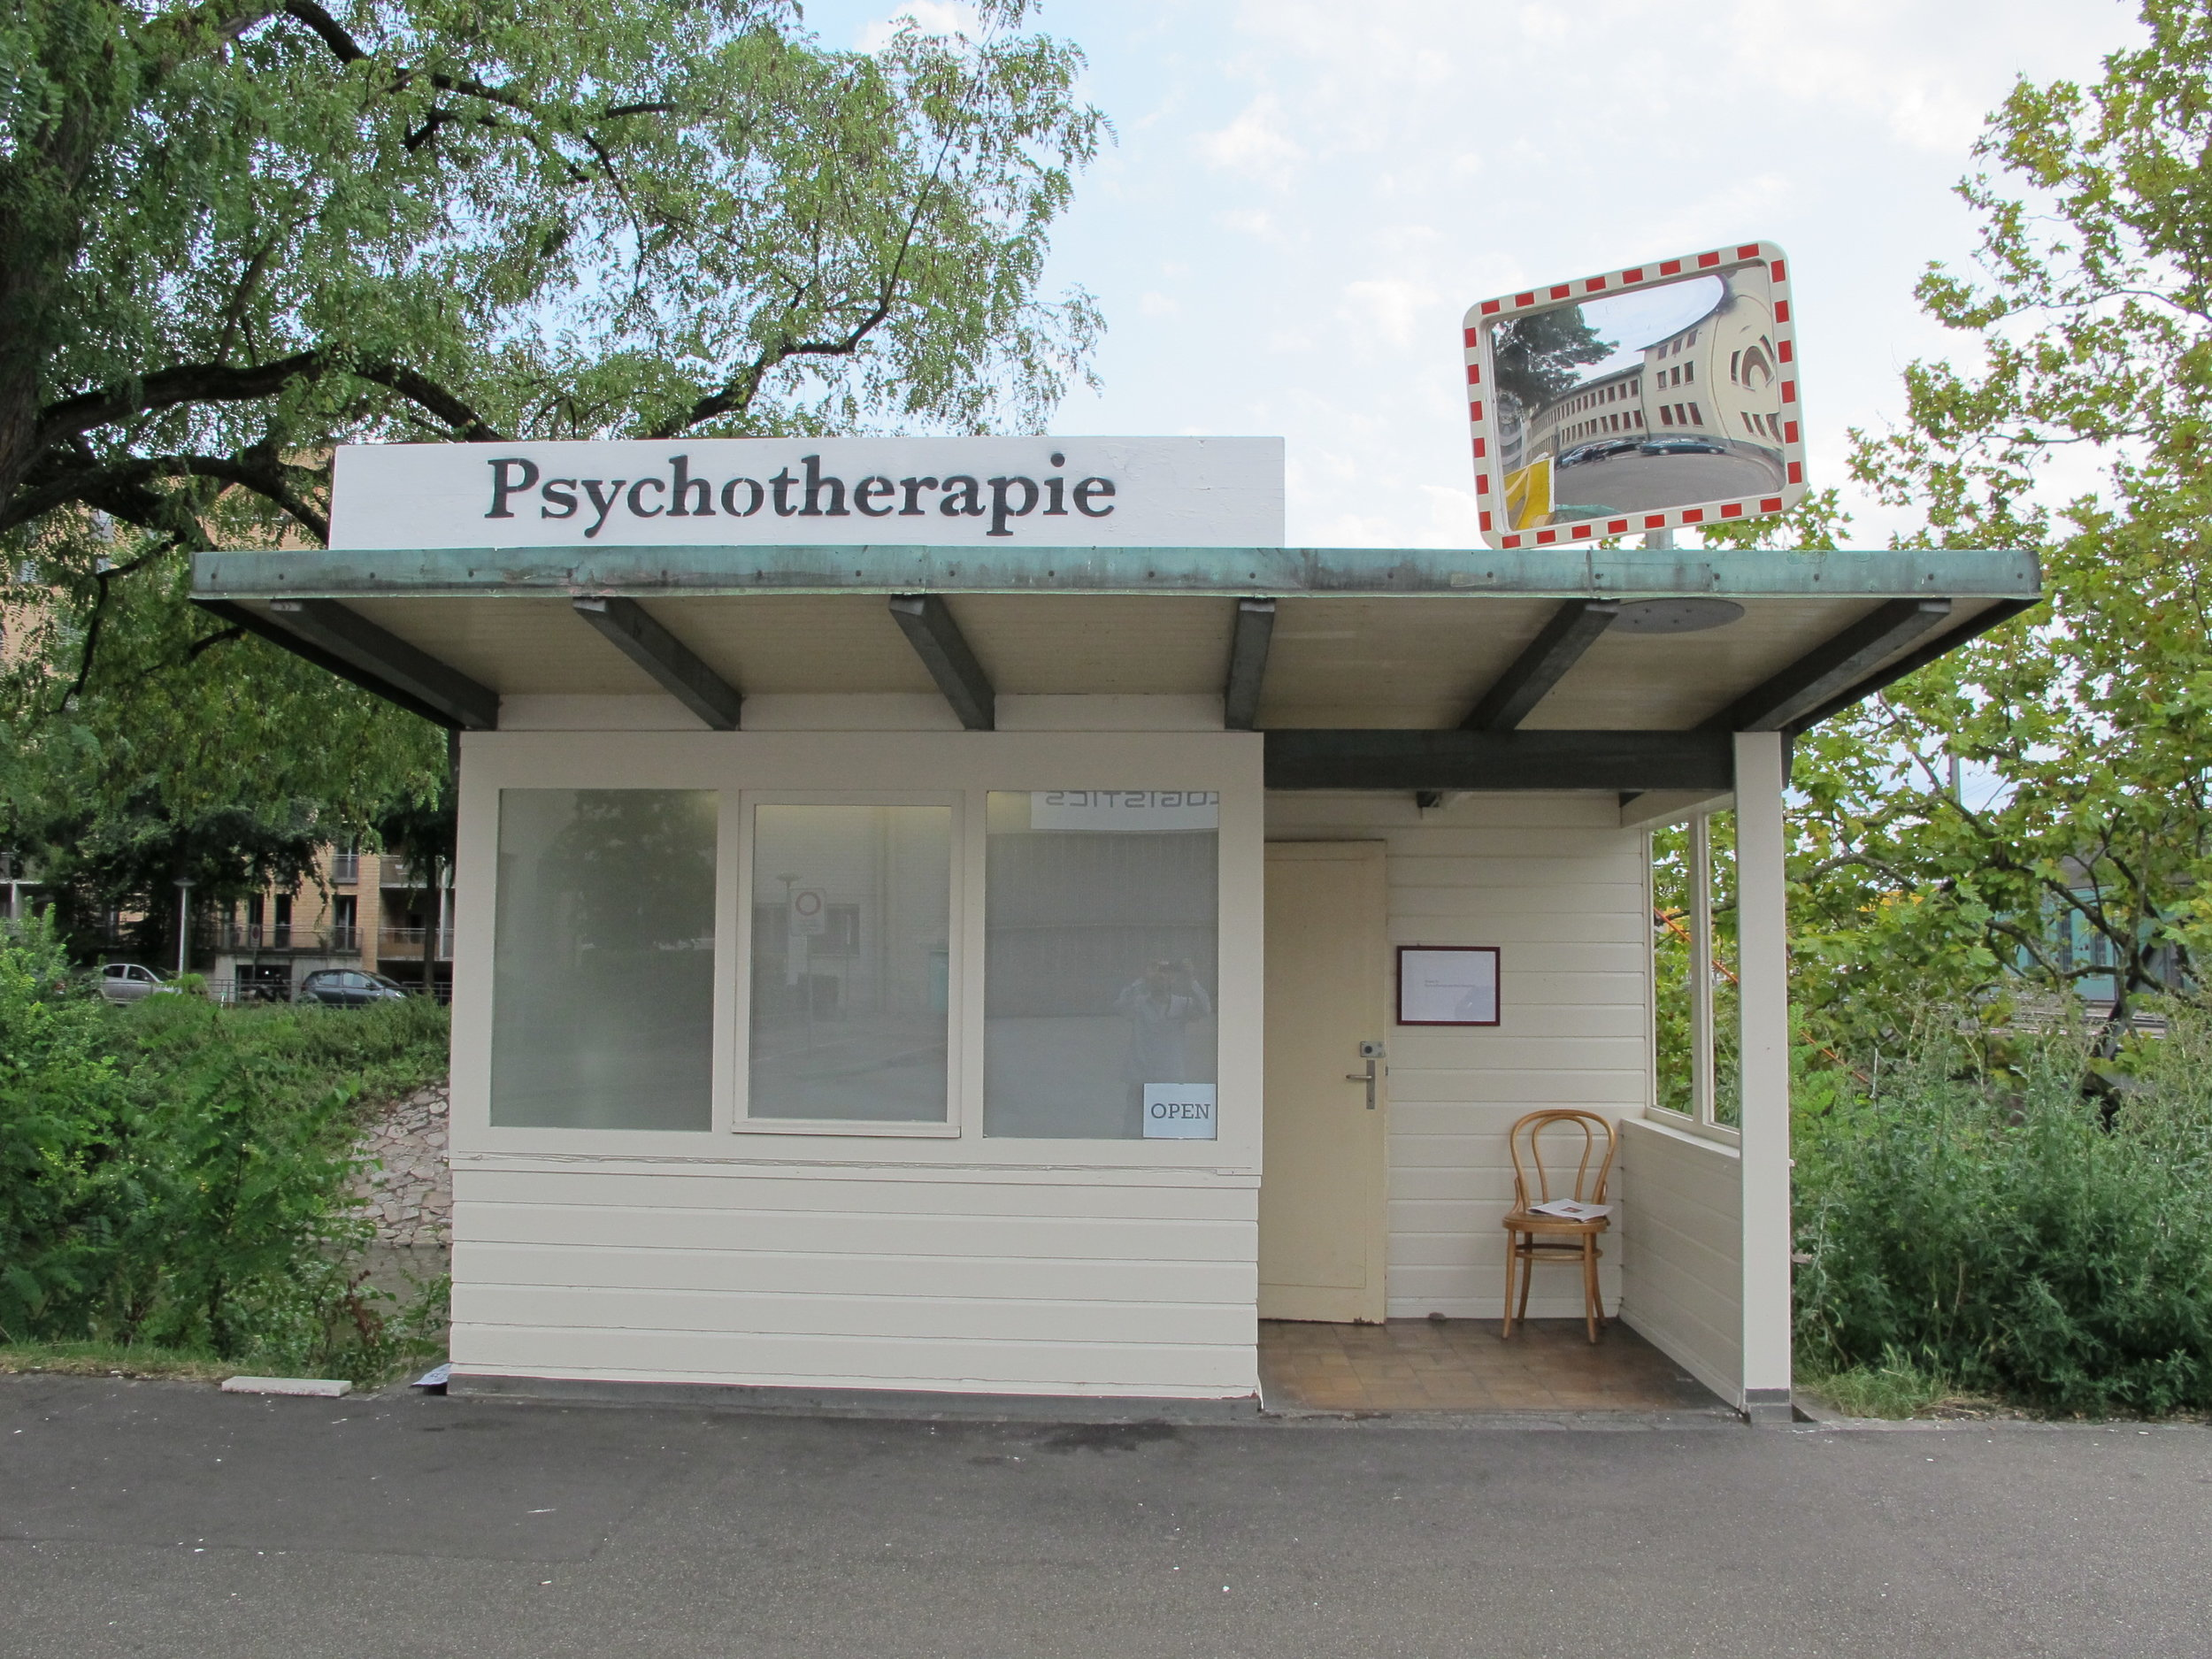 Psychotherapie-08.jpg